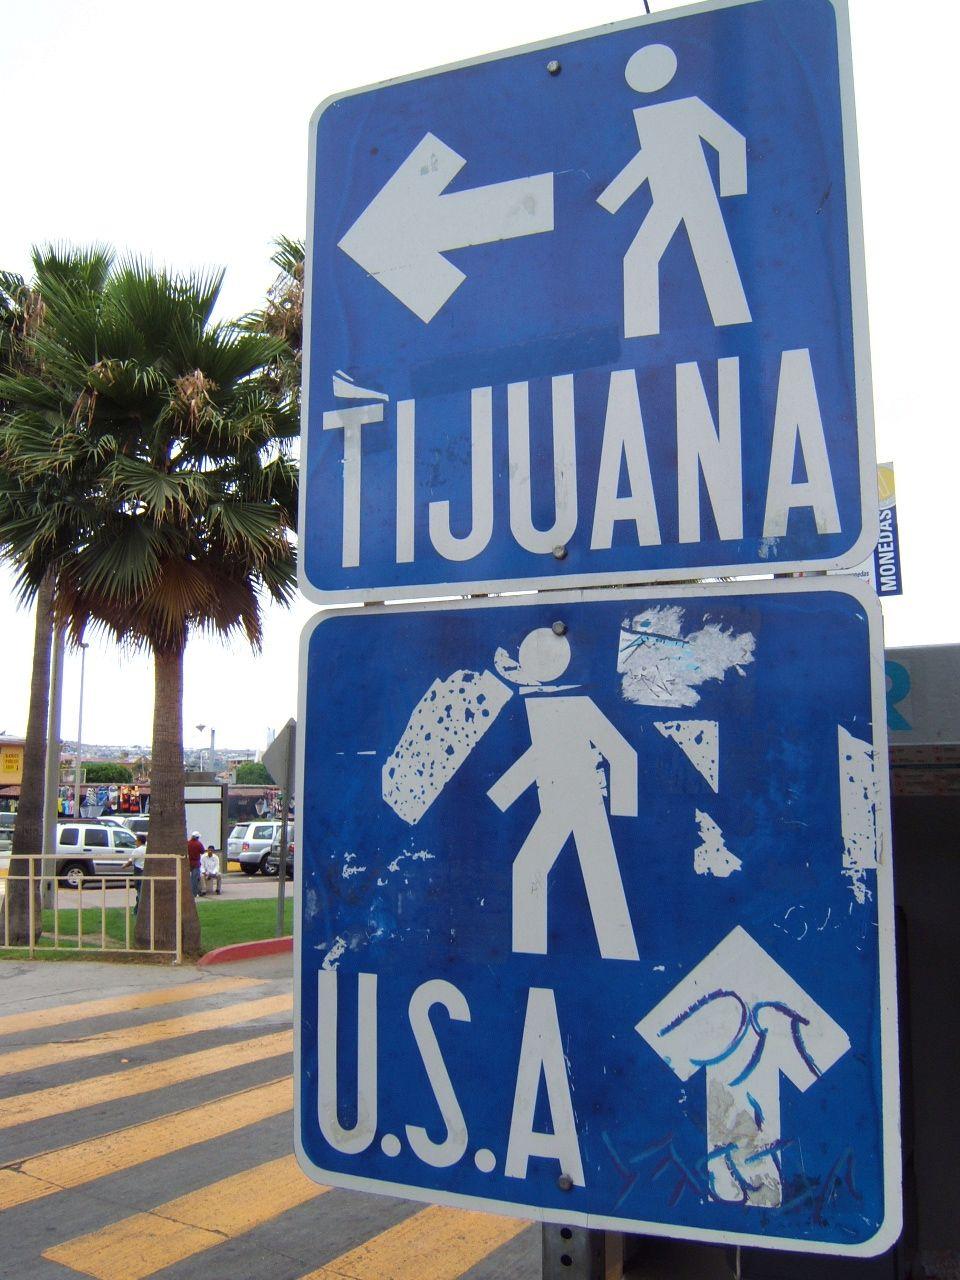 pedestrian_border_crossing_sign_tijuana_mexico.jpg